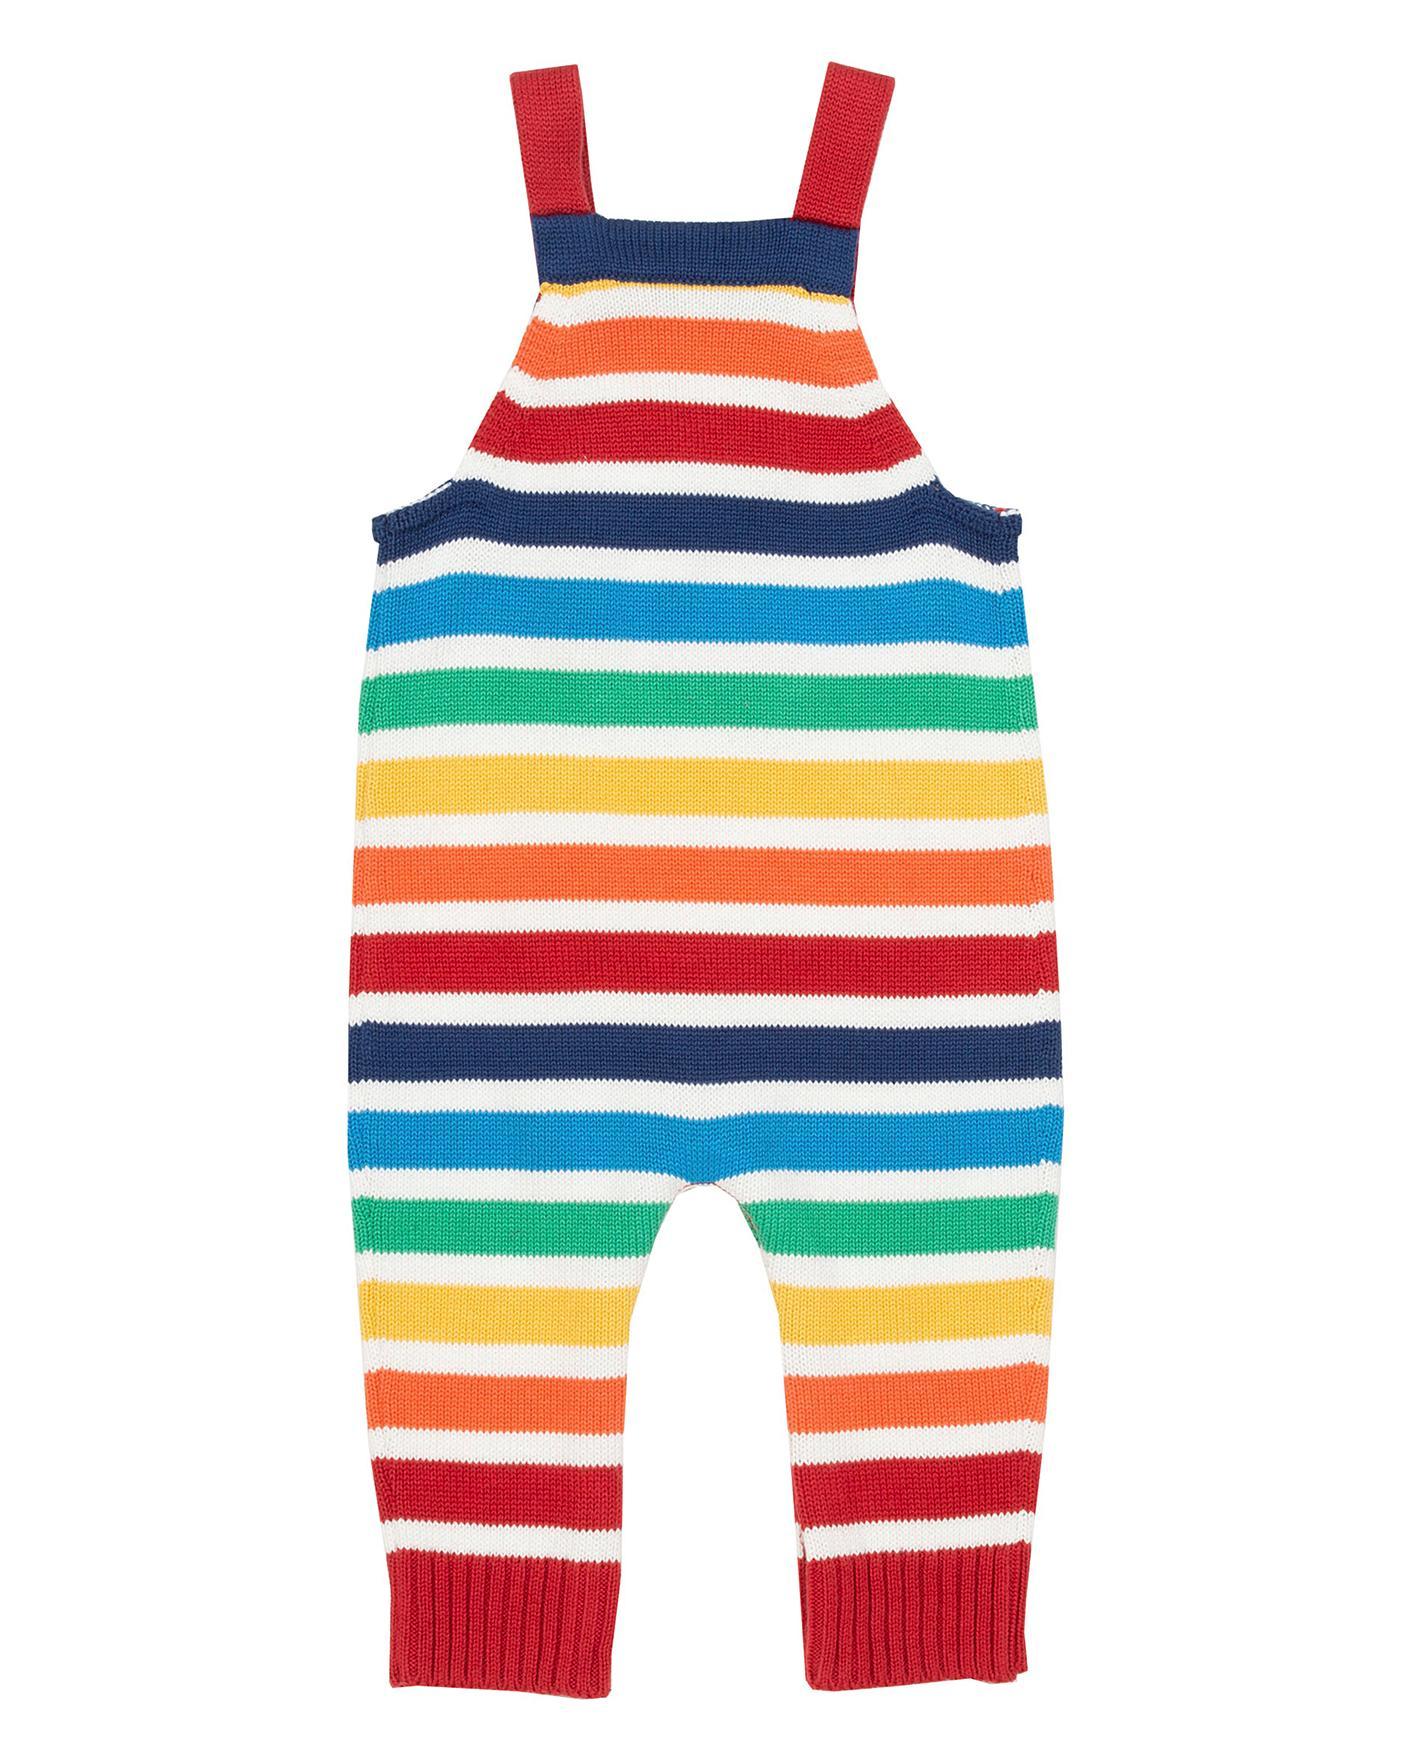 Organic Kite Baby Rainbow Knit Leggings Newborn-24 Months